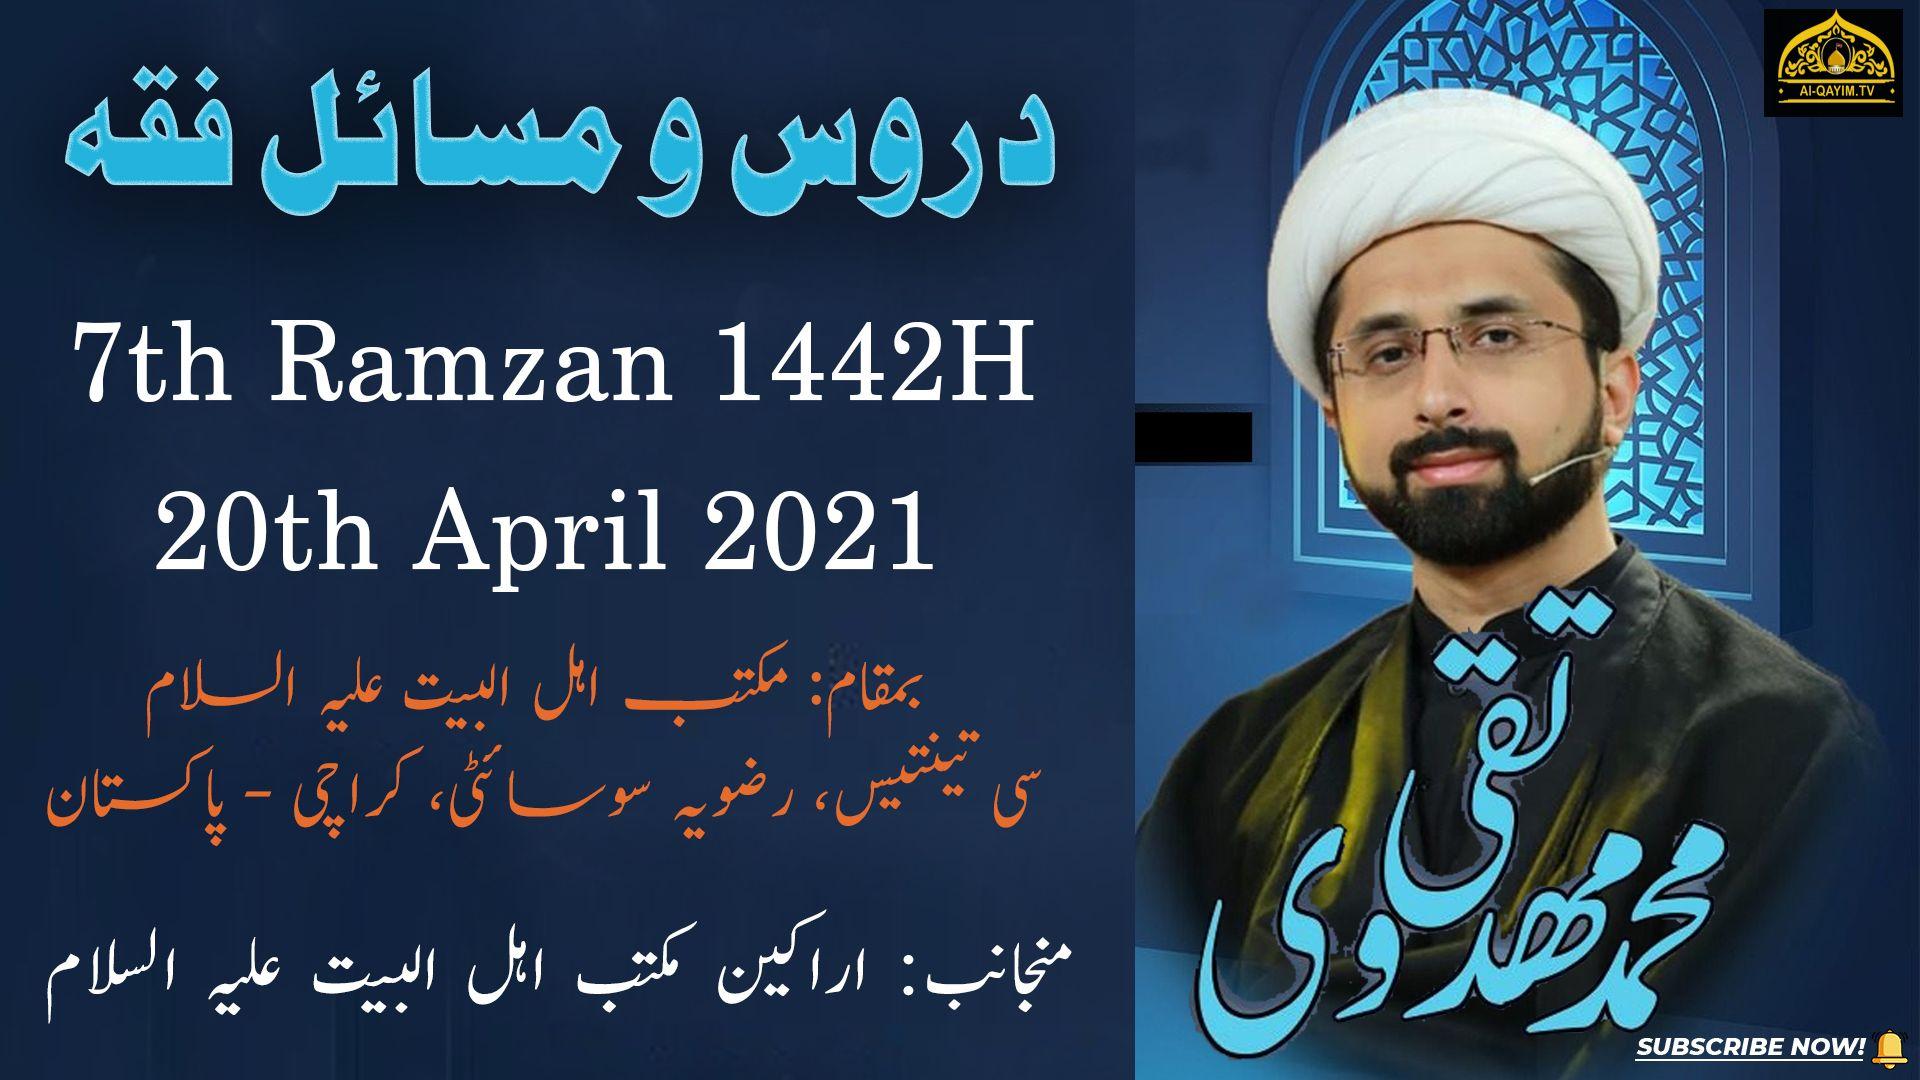 Moulana Muhammad Taqi Mehdavi | Dars Wo Masail Fiqae | 7th Ramzan 2021 | Maktab-e-Ahlebait - Karachi